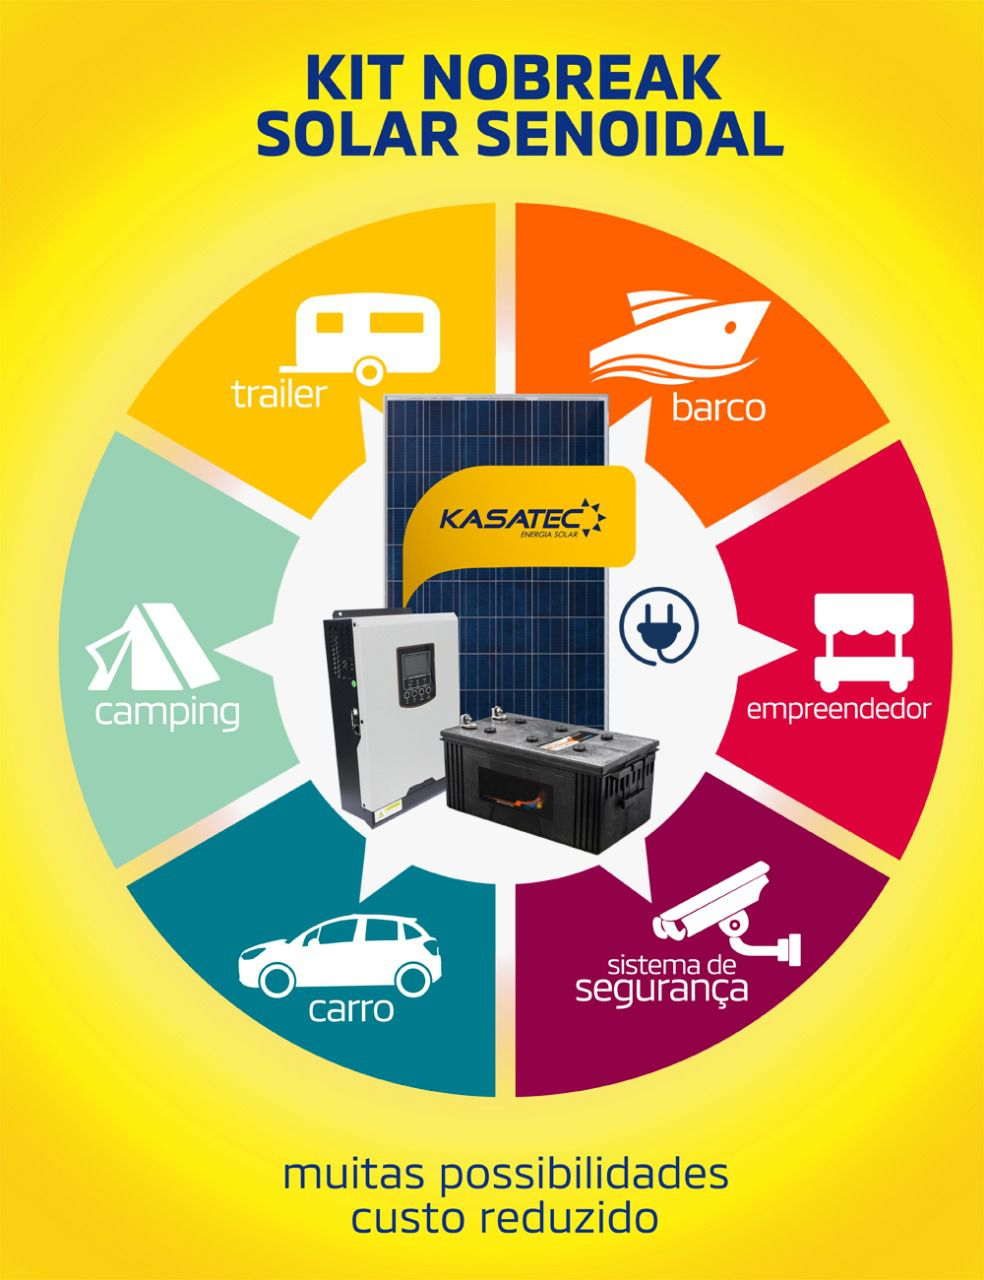 Kit Nobreak Solar Senoidal 1000W  - Kasatec Energia Solar